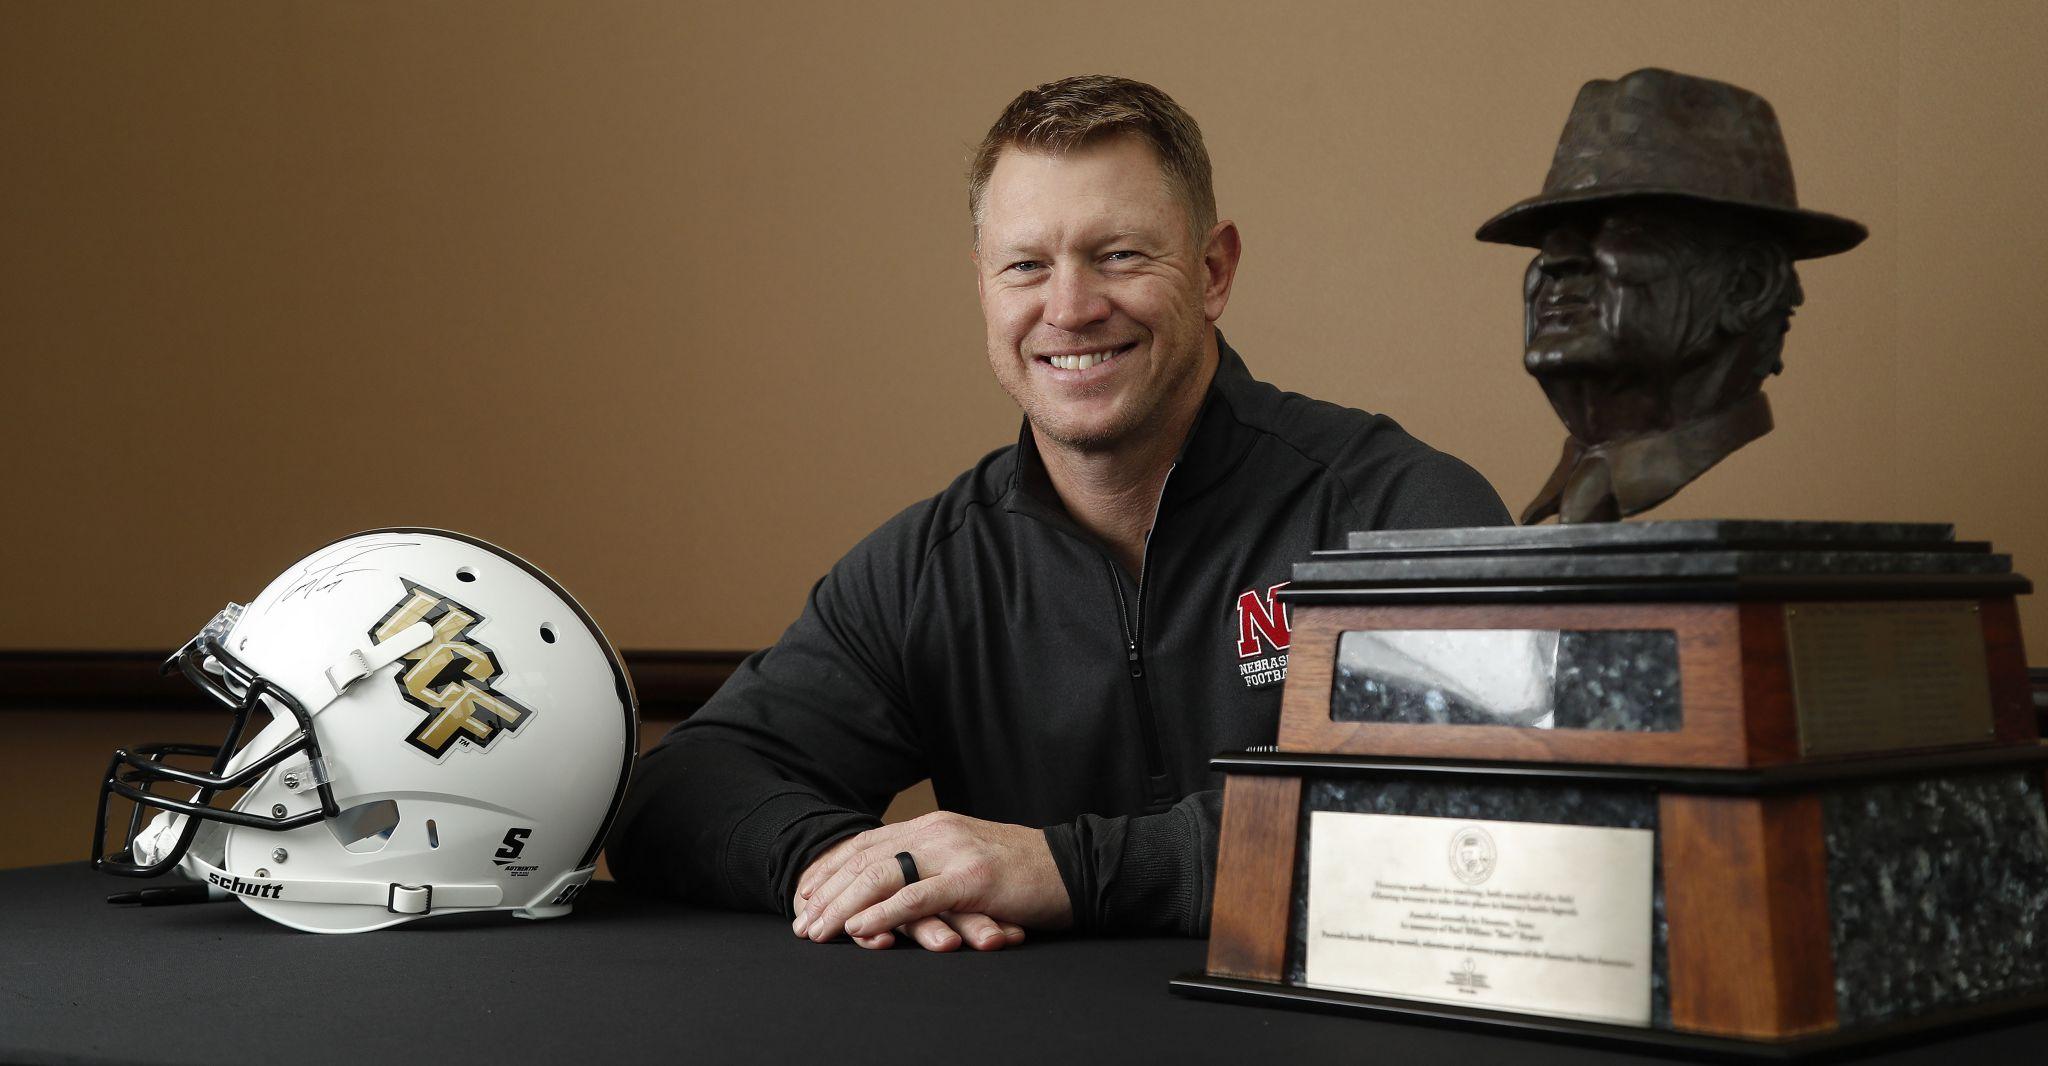 Scott Frost Nfl Stats >> Scott Frost wins Bear Bryant Coach of the Year Award - San Antonio Express-News